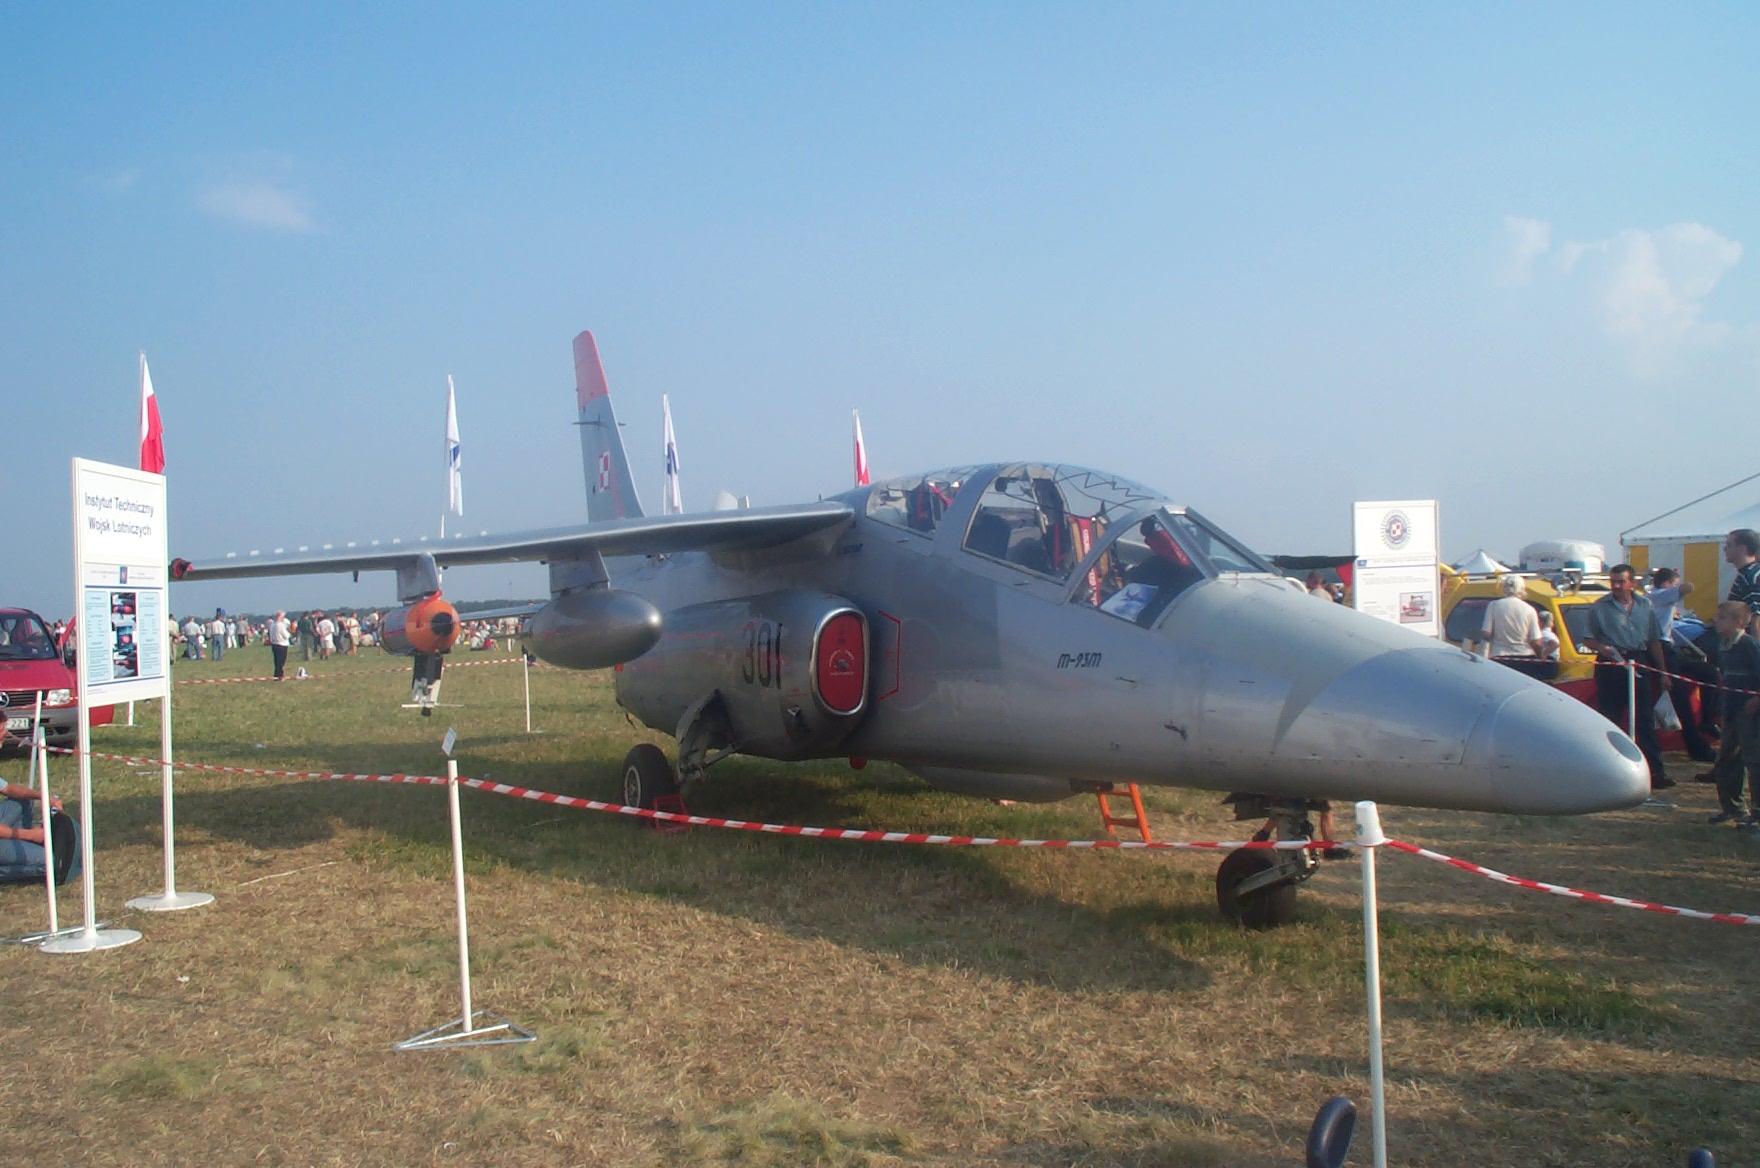 PZL I-22 Iryda M-93M nb 0301. Air Show Radom 2002. Photo by Dawid Kasprzyk.